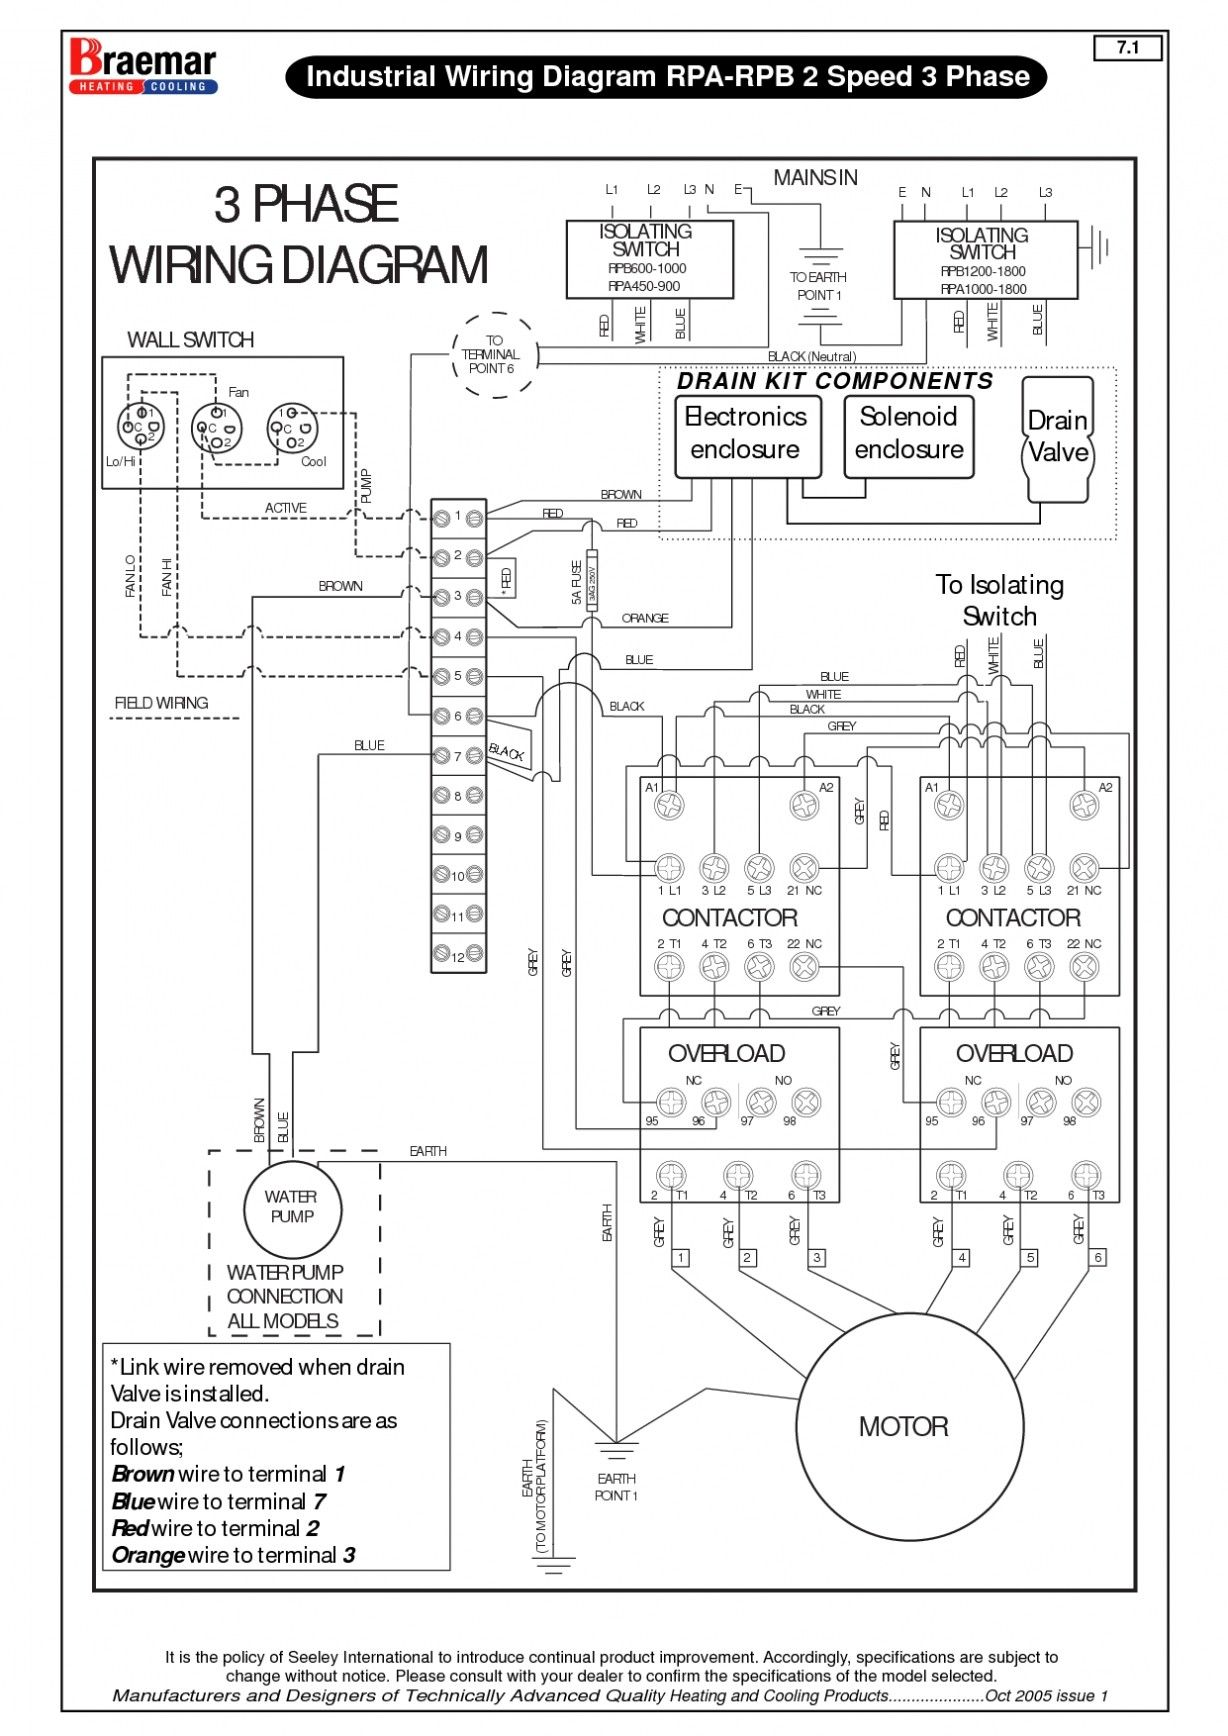 medium resolution of unique motor terminal connection diagram diagram wiringdiagram diagramming diagramm visuals visualisation graphical